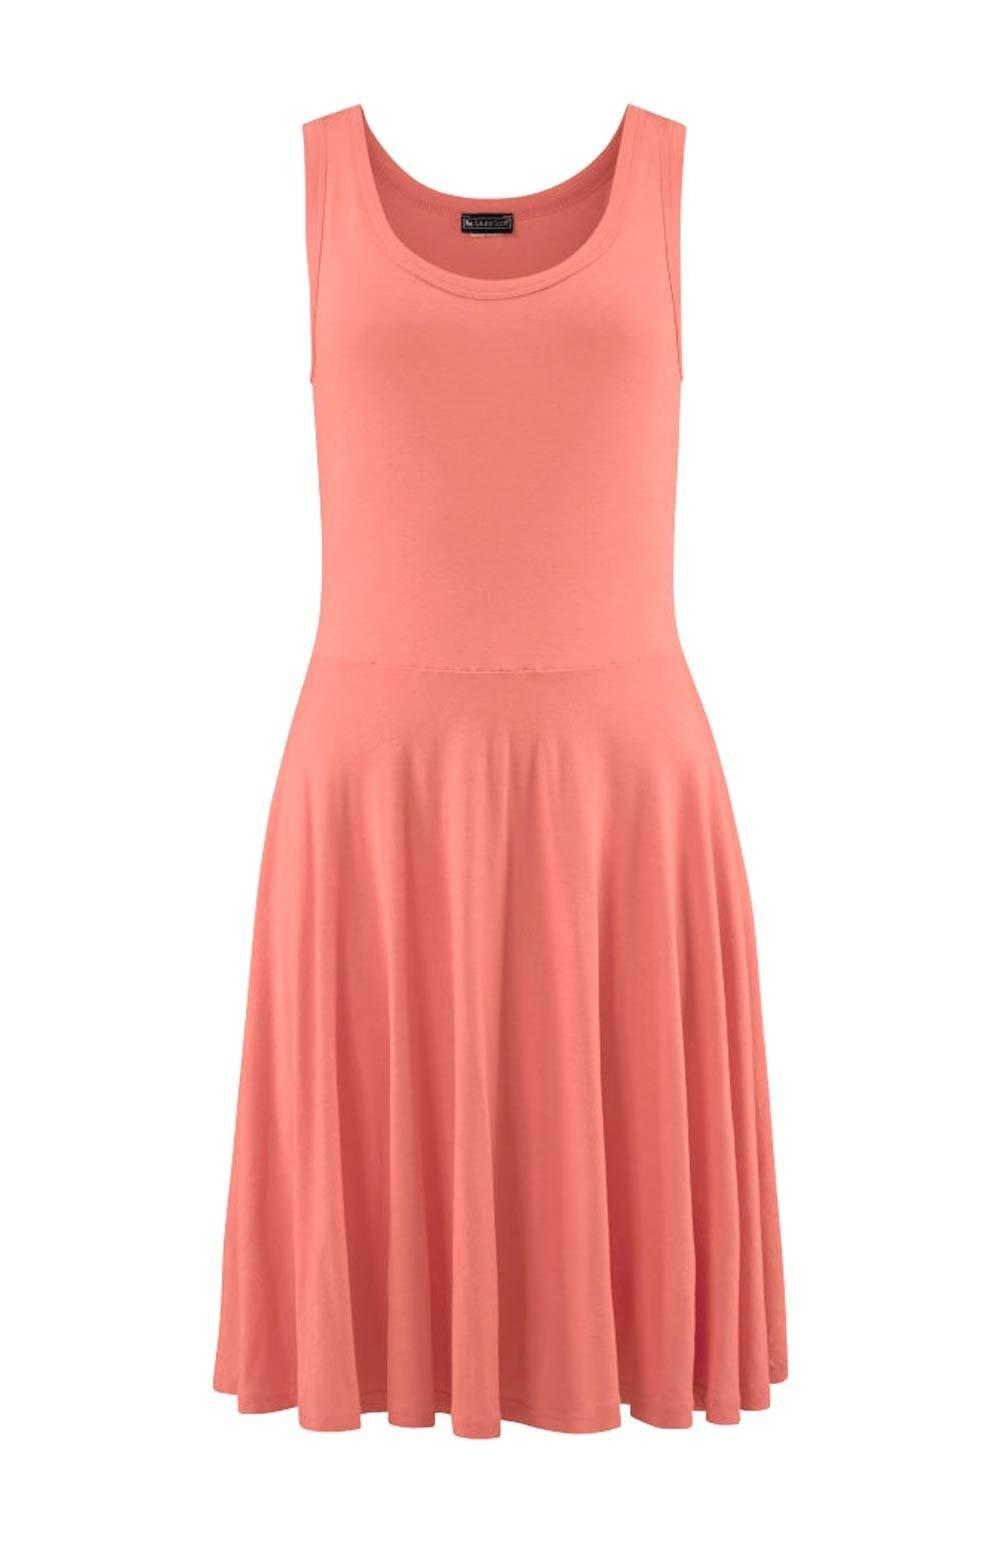 Designer Kreativ Kleid Lachs Design13 Elegant Kleid Lachs Boutique